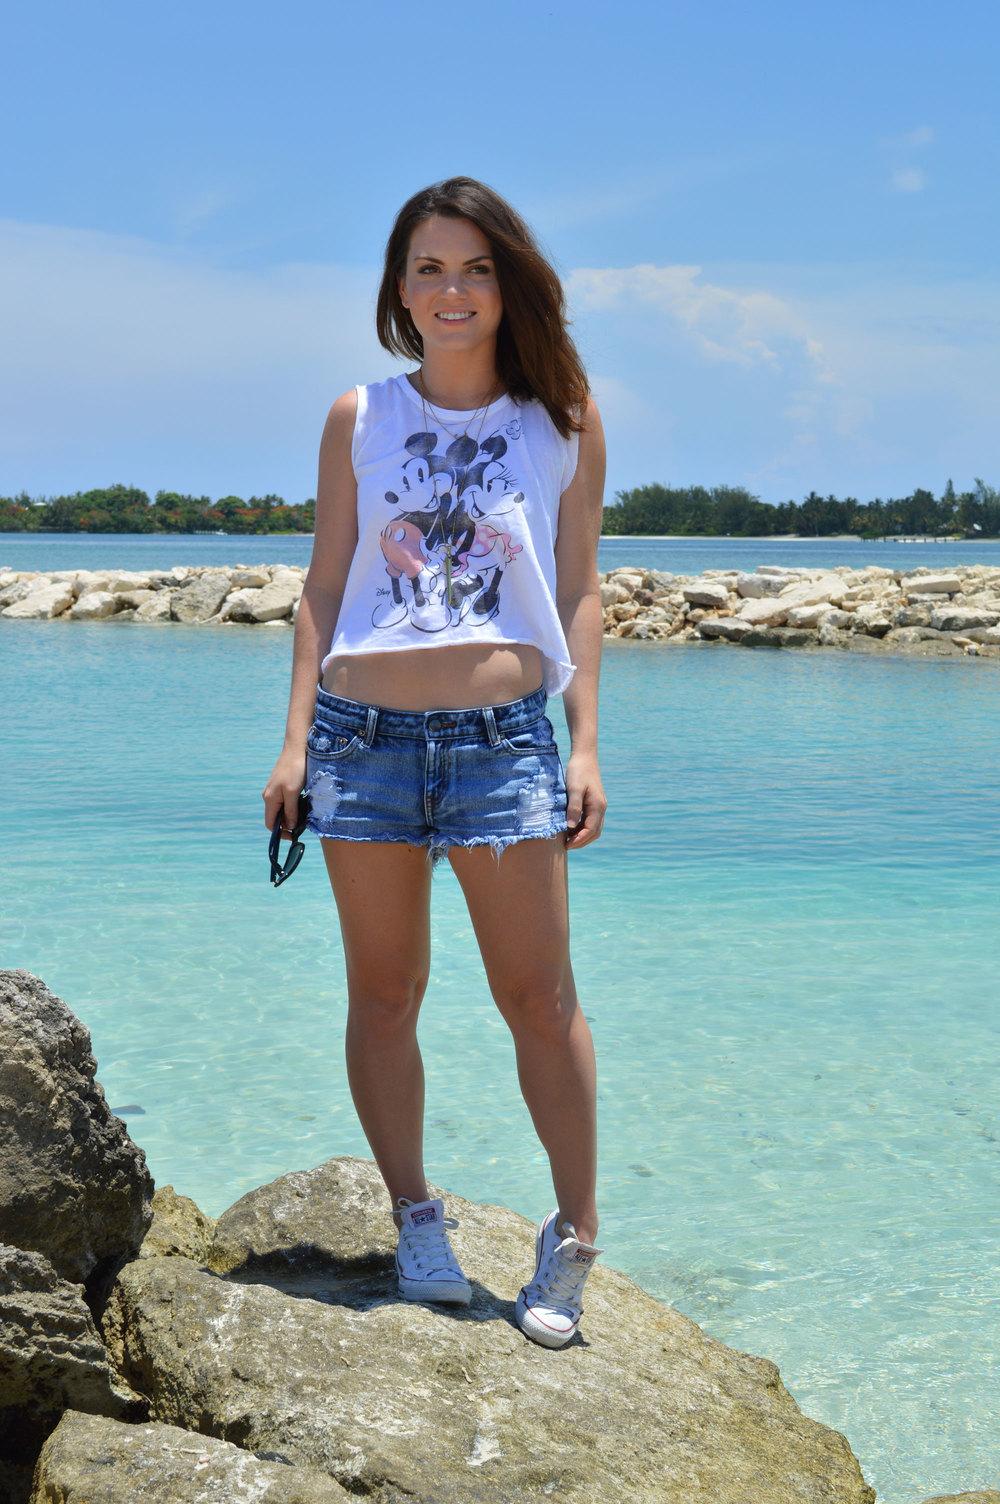 junk-food-minnnie-mickey-crop-tank-forever21-denim-shorts-cutoffs-beach-nassau-bahamas-lyford-cay-lilac-lillies-boutique-style-blogger.jpeg